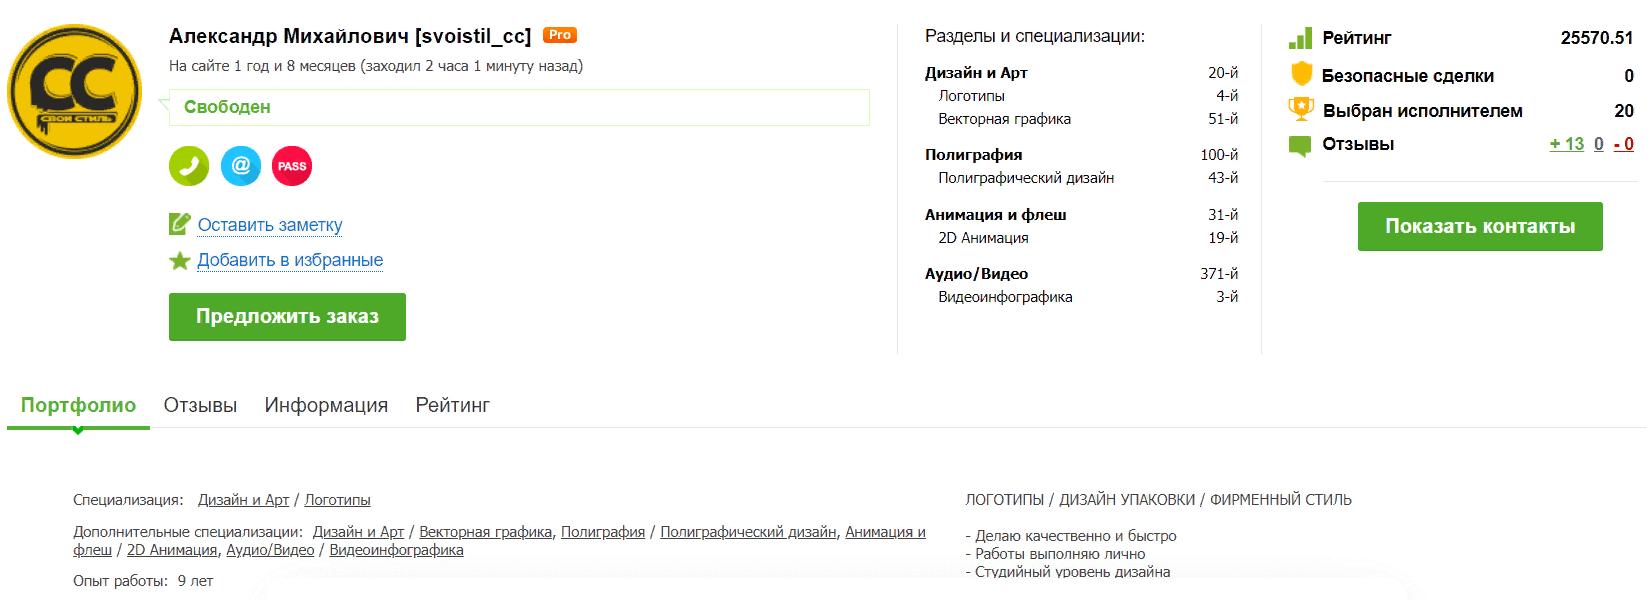 портфолио дизайнера на бирже фриланса